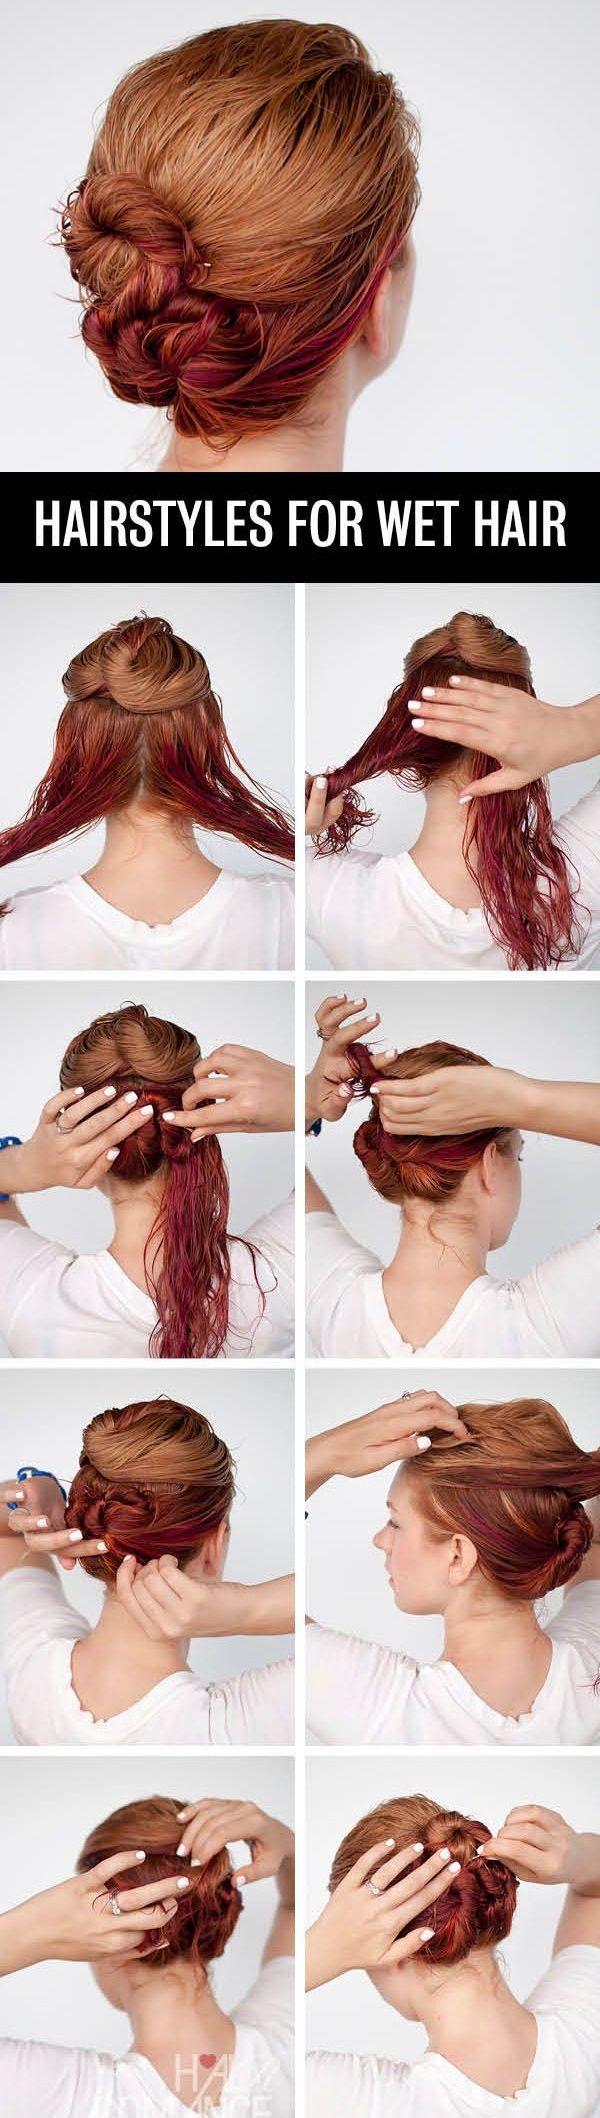 best 25+ wet hair dos ideas on pinterest | beach waves tutorial